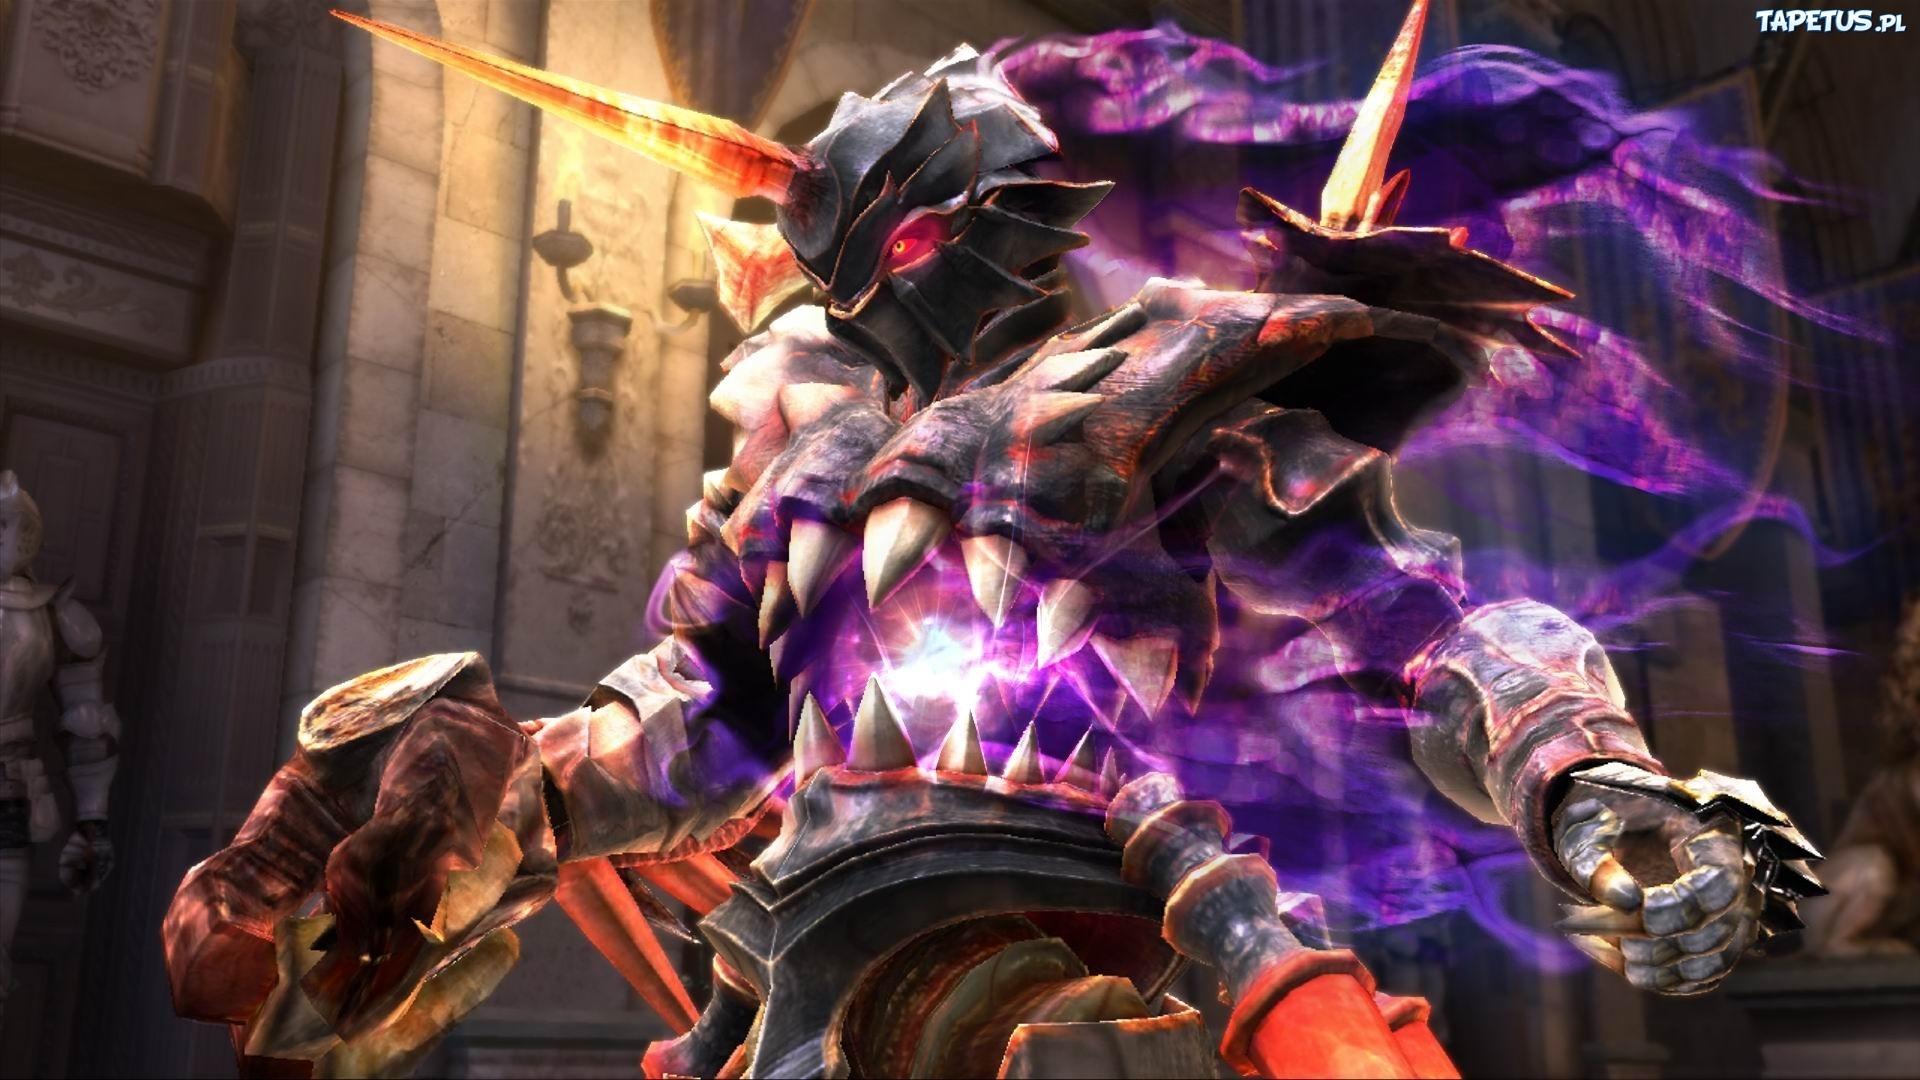 Knightmare II - The Edge Of Knight